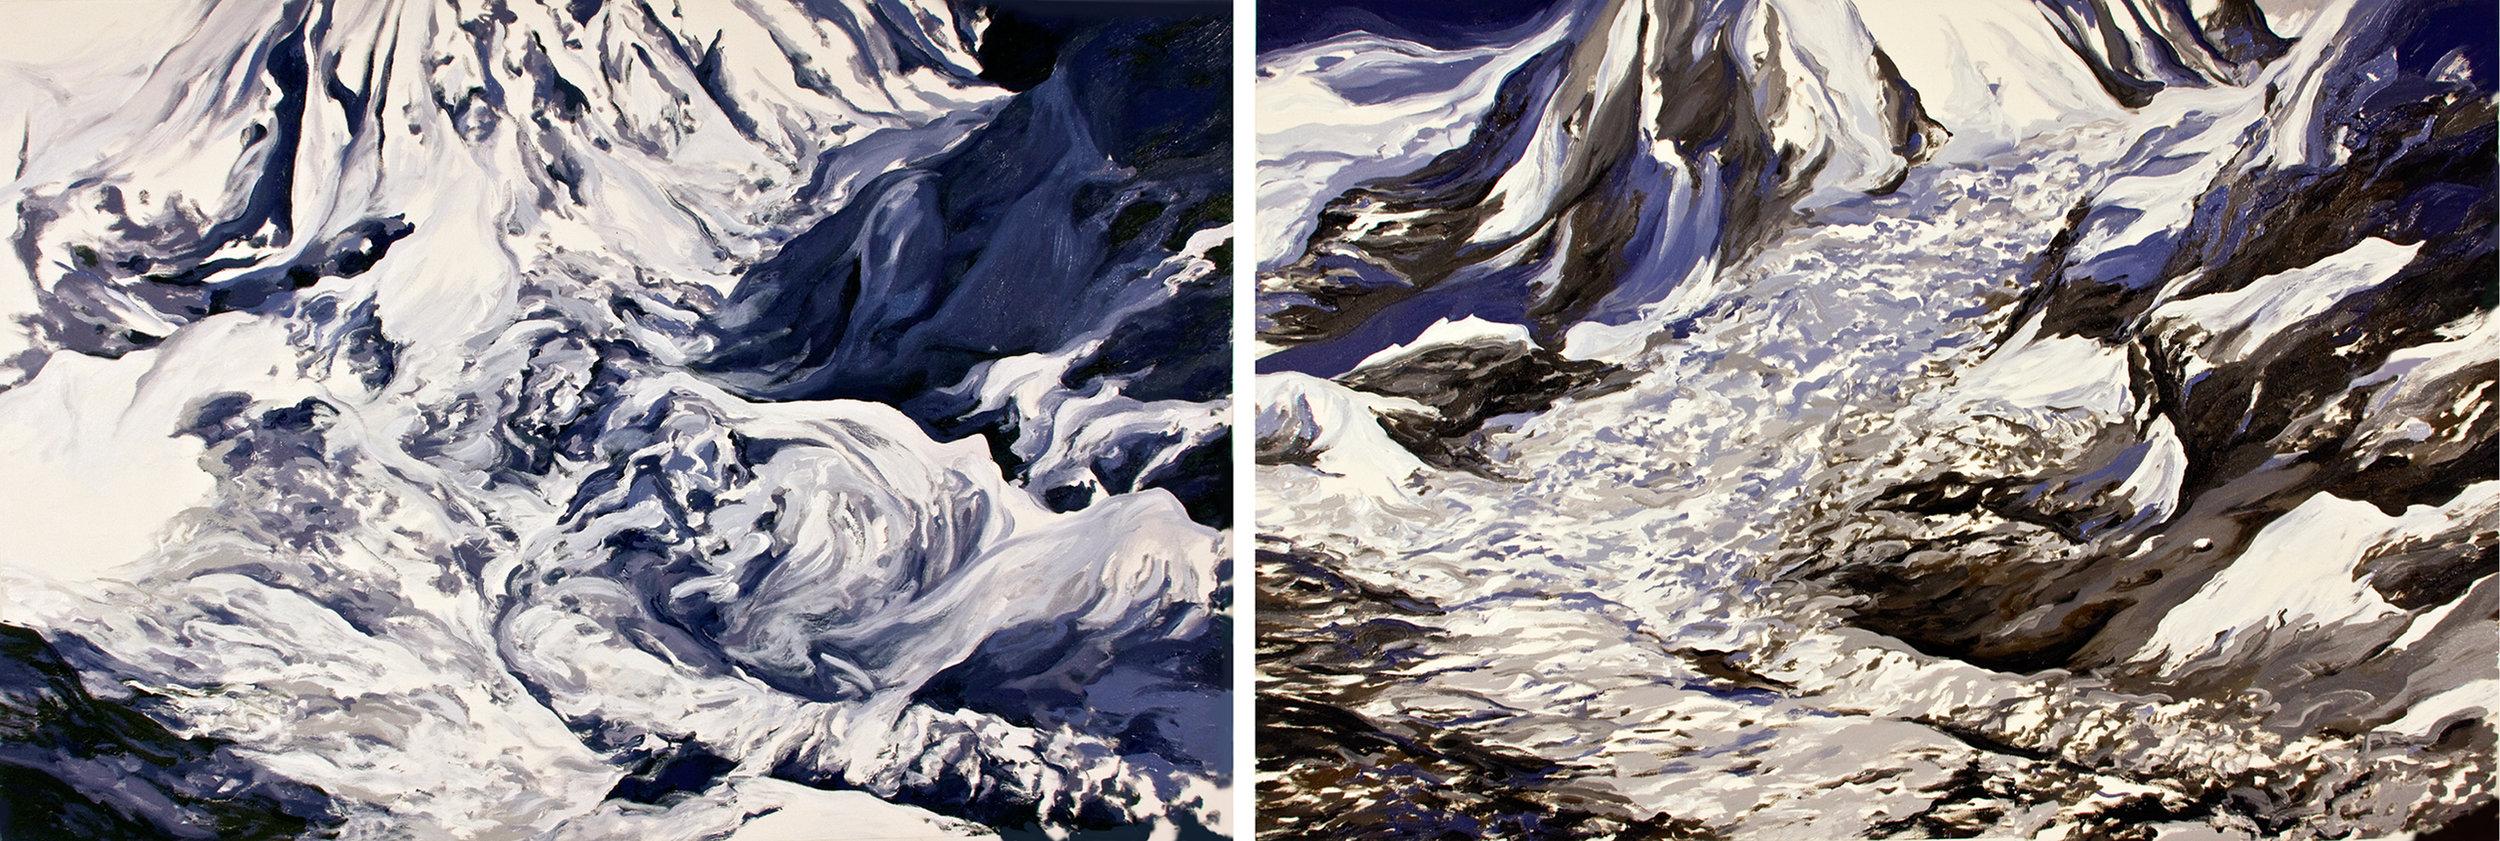 Khumbu Icefall 1, 2